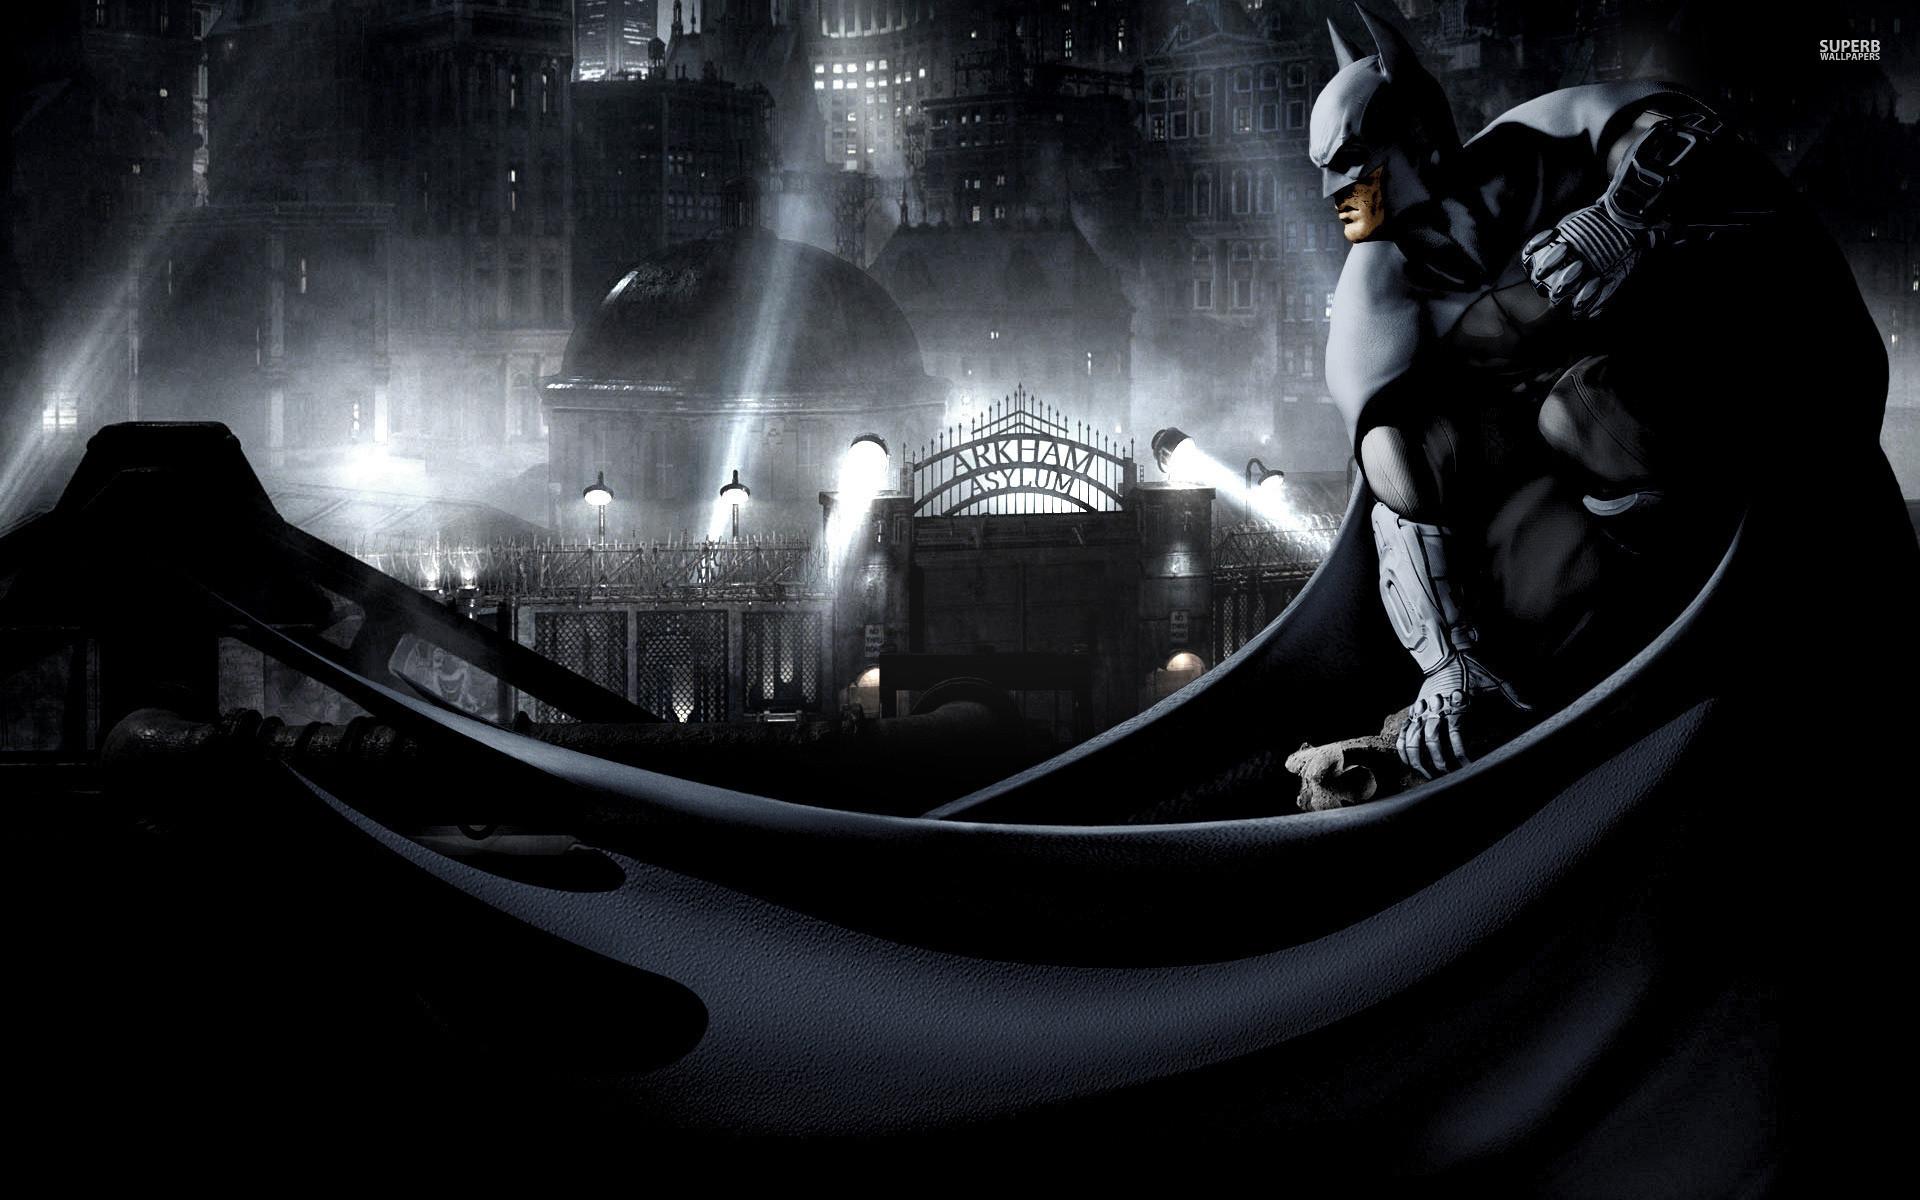 … batman wallpaper on wallpaperget com …